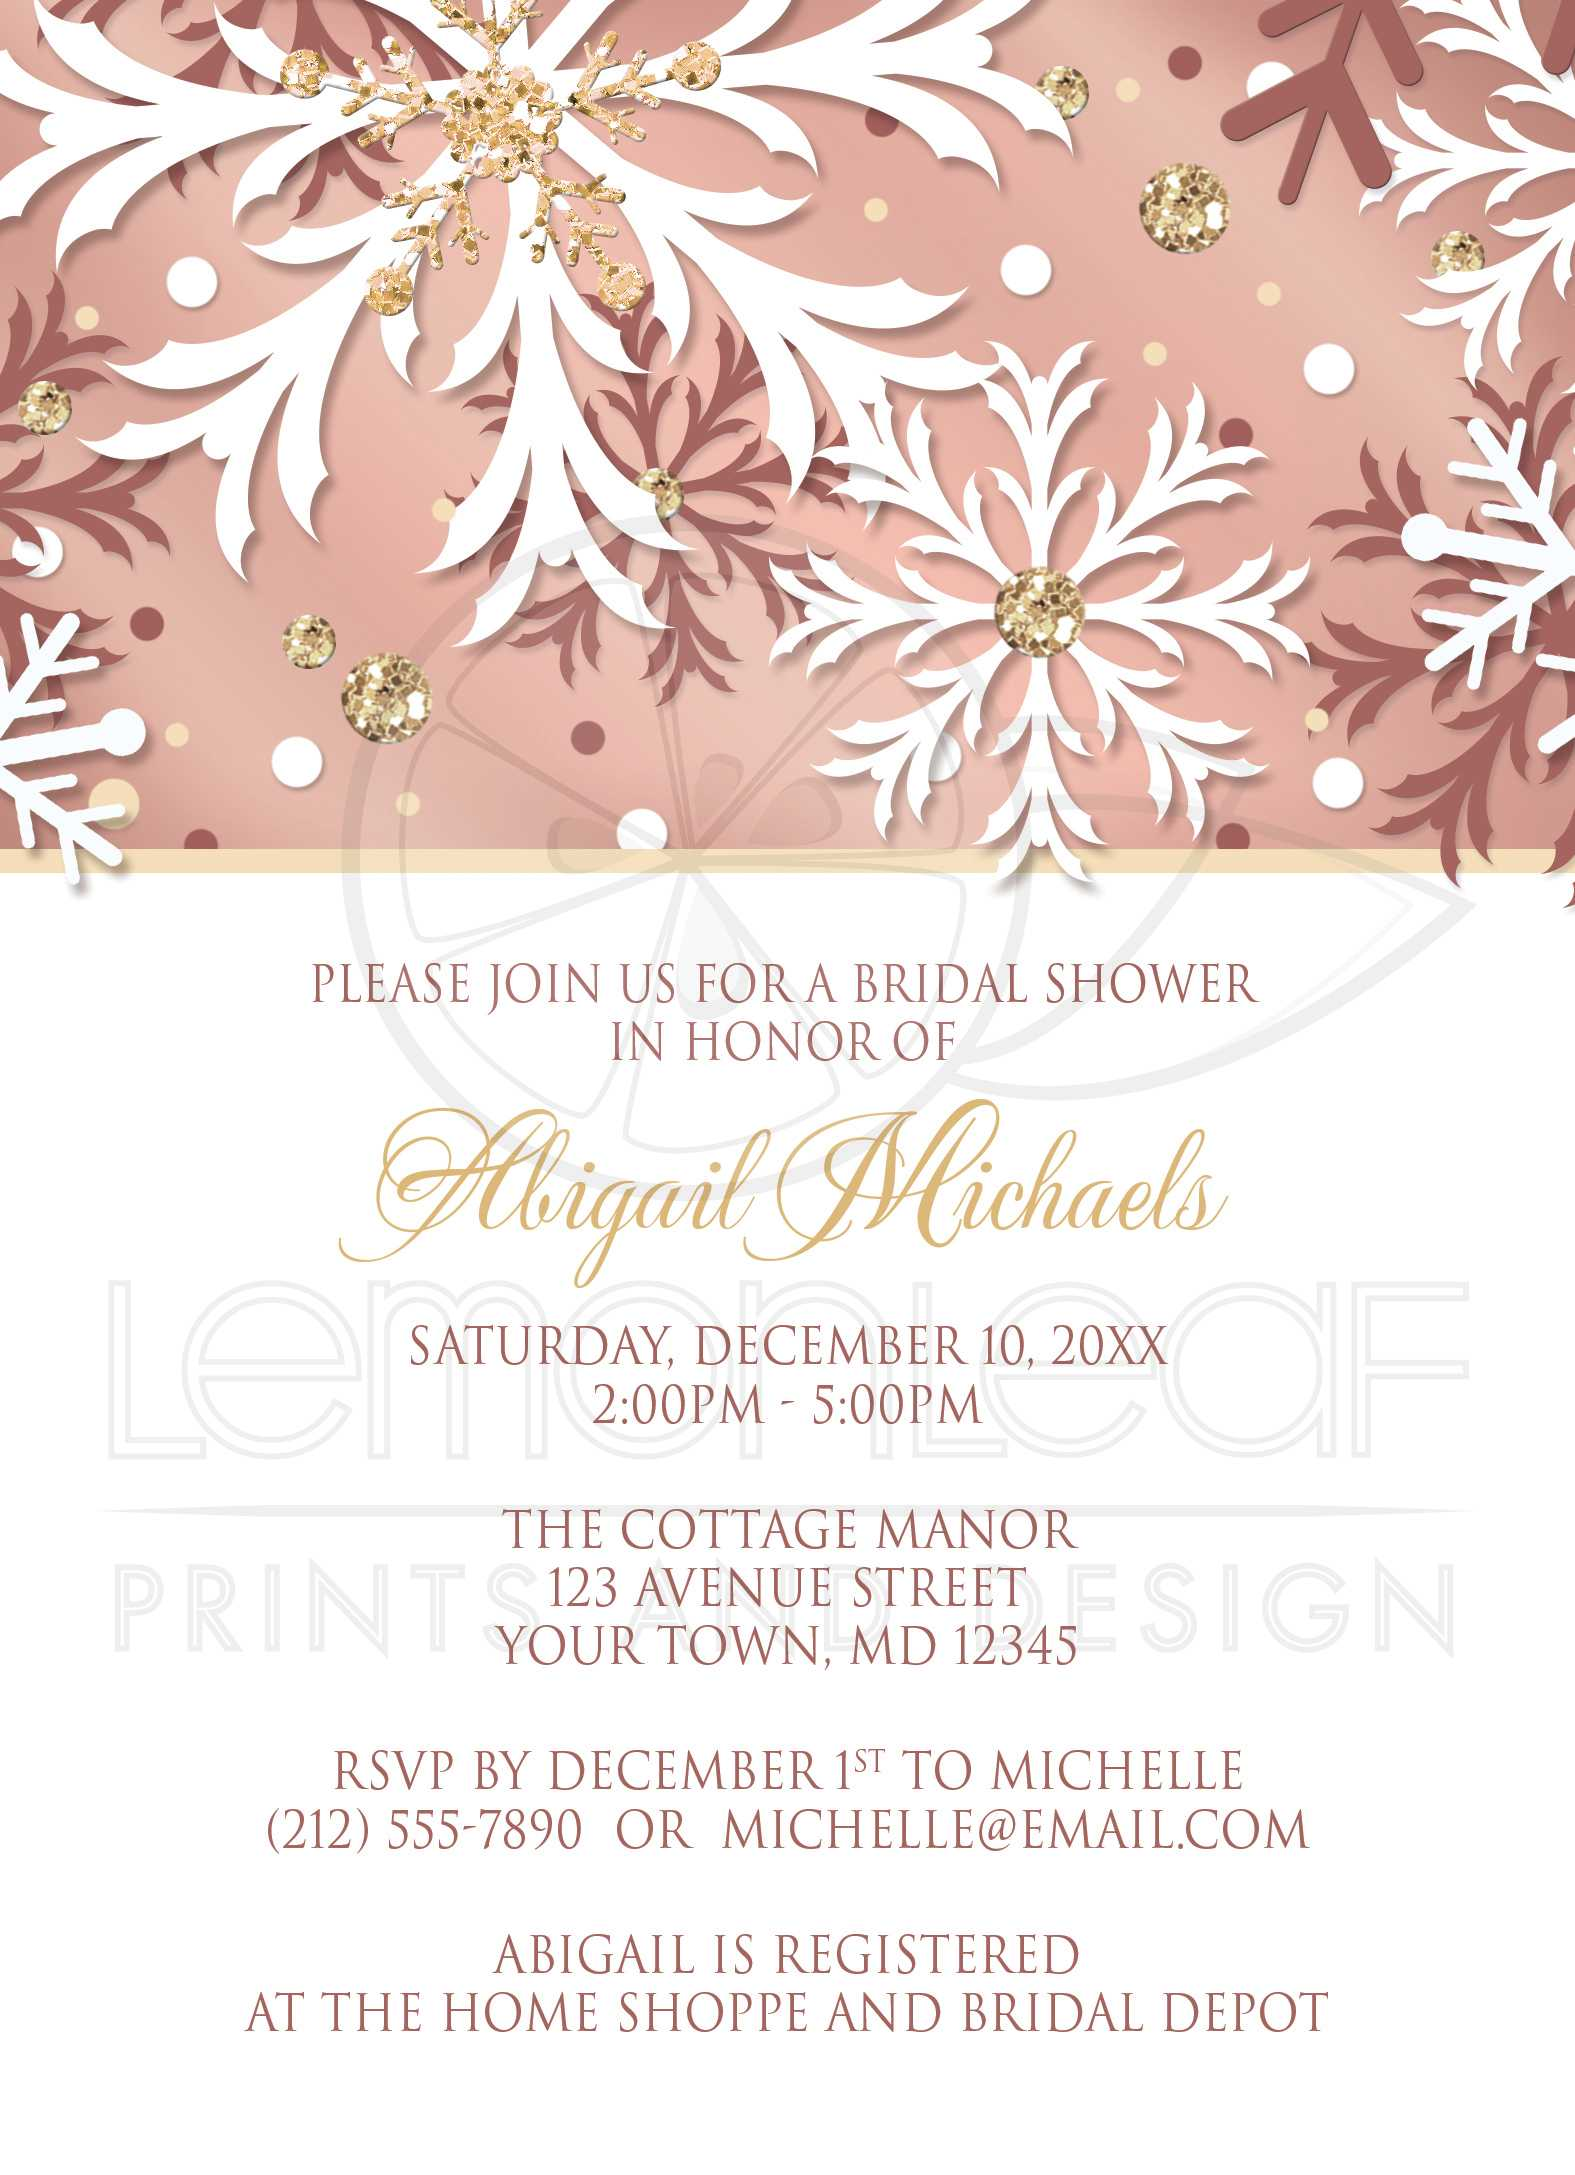 Bridal Shower Invitations Rose Gold Winter Snowflake